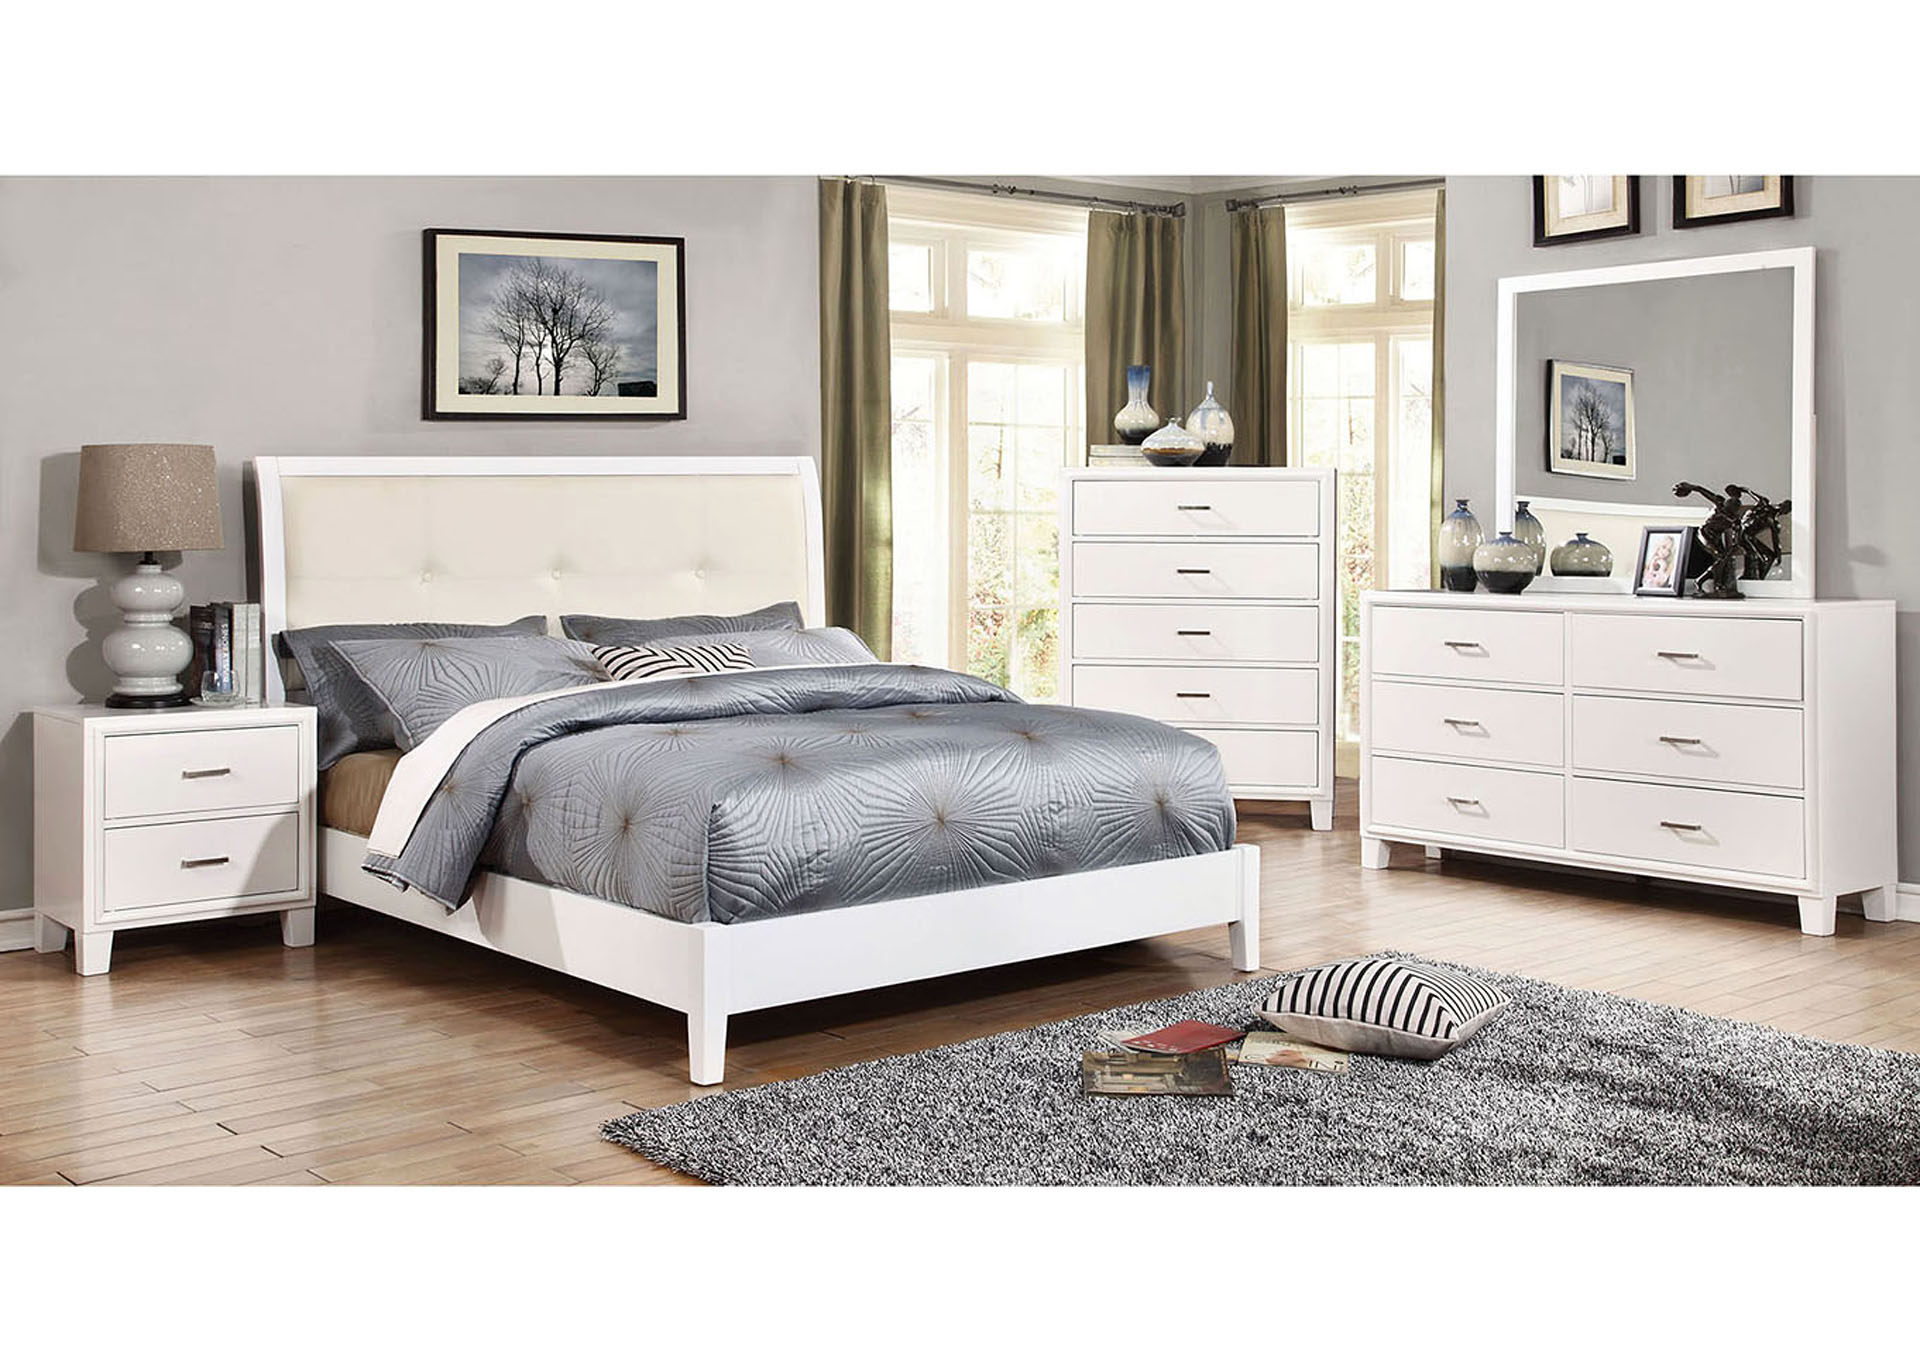 Furniture liquidators baton rouge la enrico i white for Furniture and mattress liquidators baton rouge